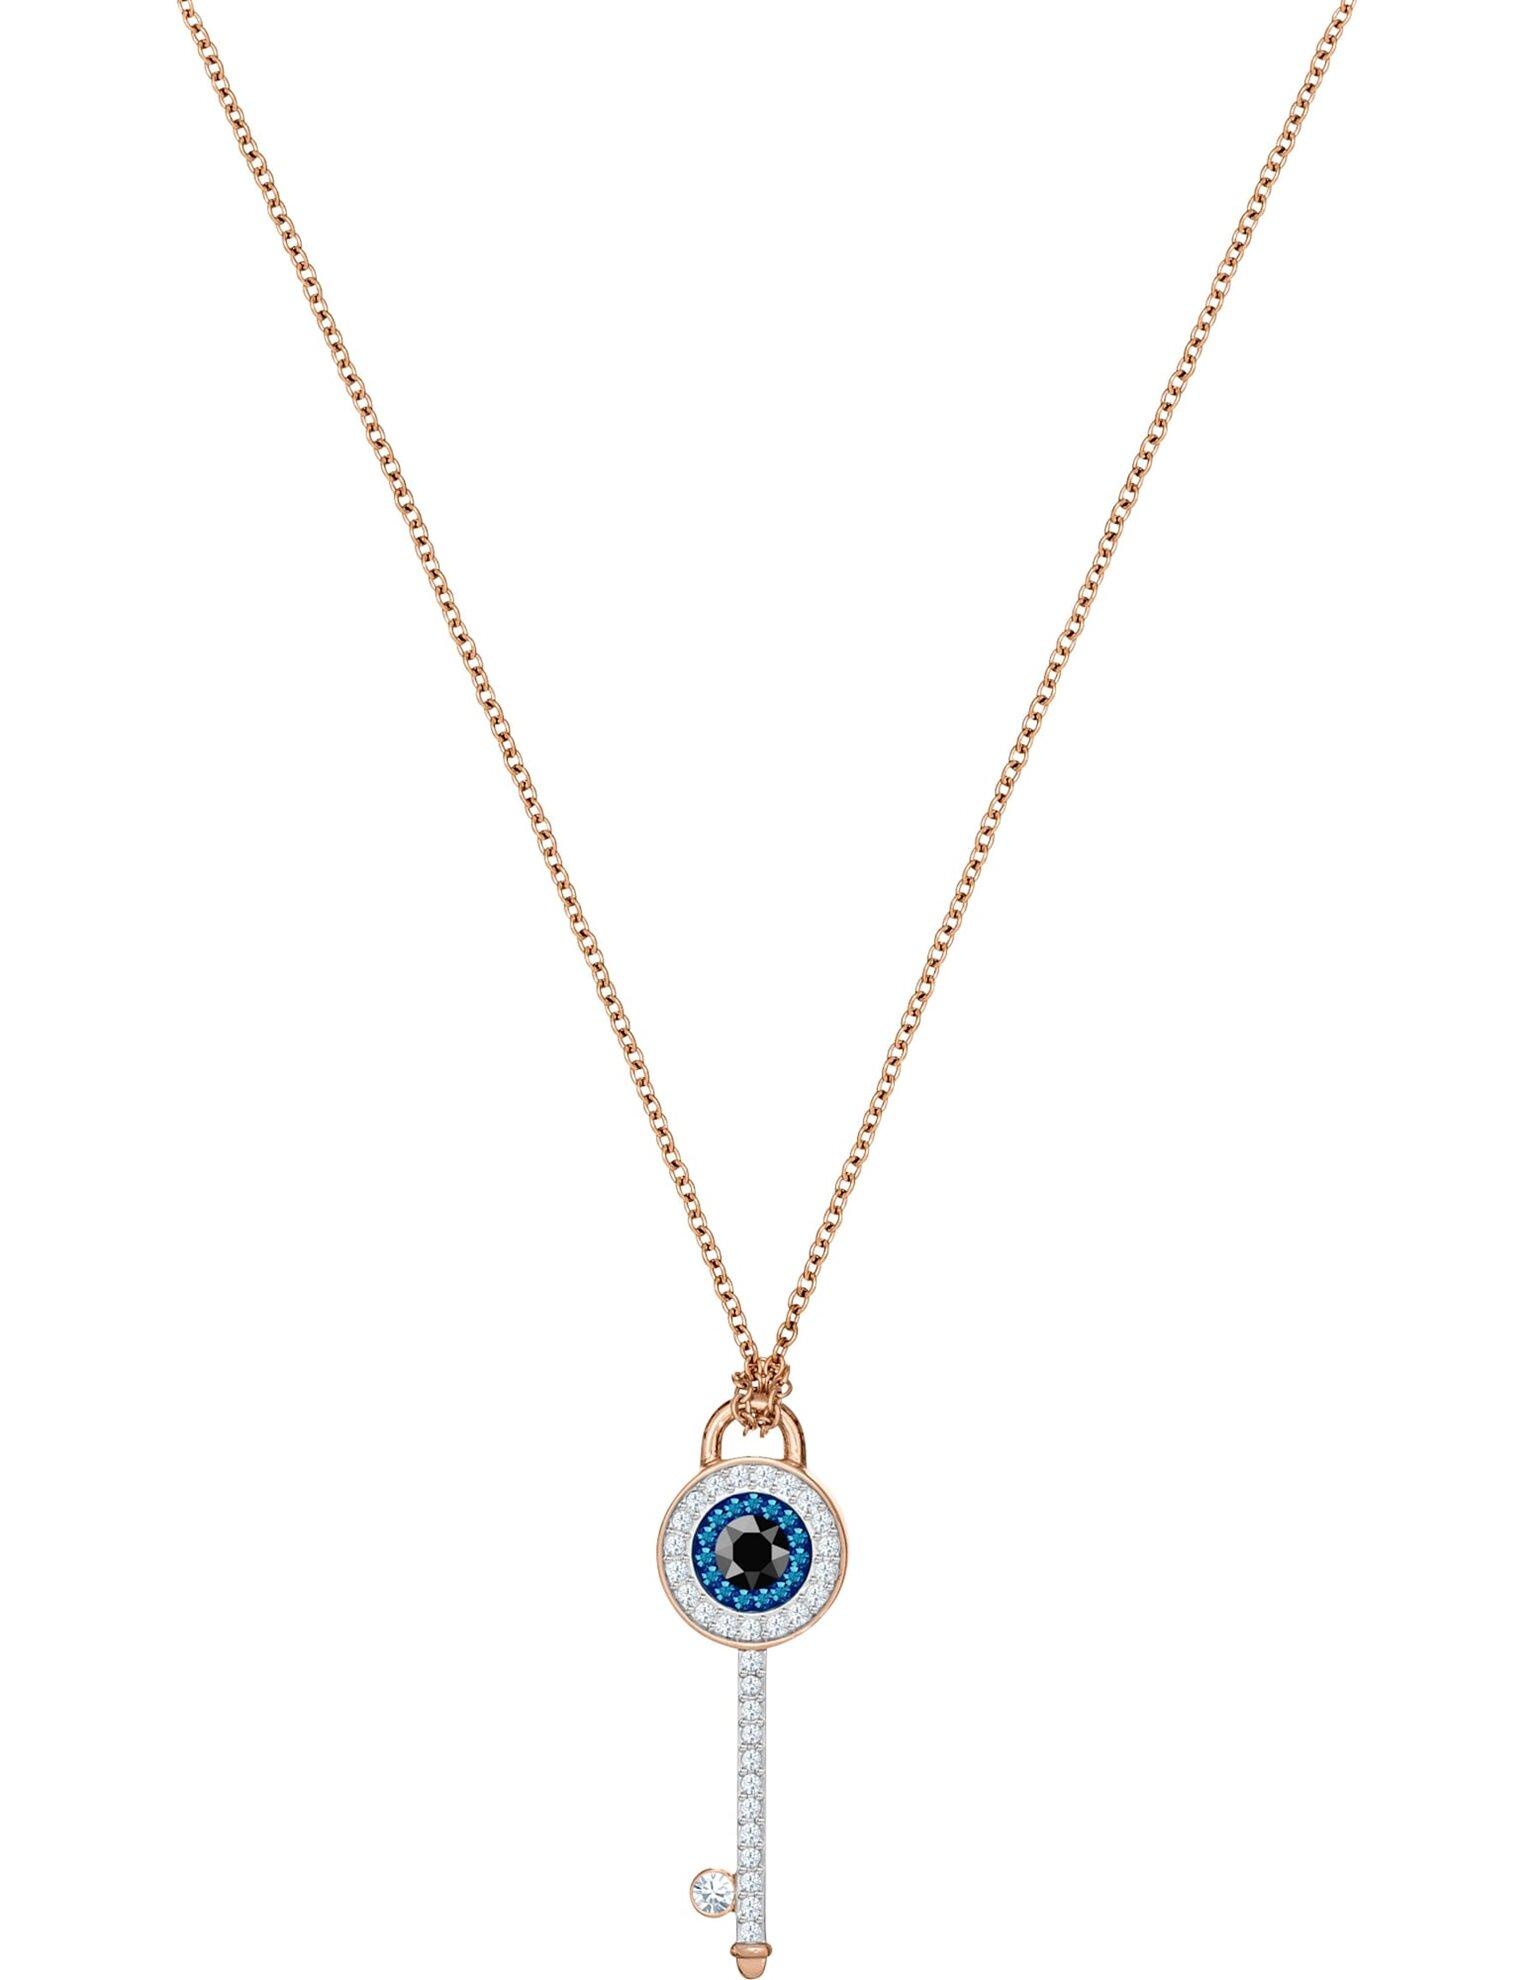 Picture of Swarovski Symbolic Evil Eye kolye, Cok Renkli, Pembe altın rengi kaplama